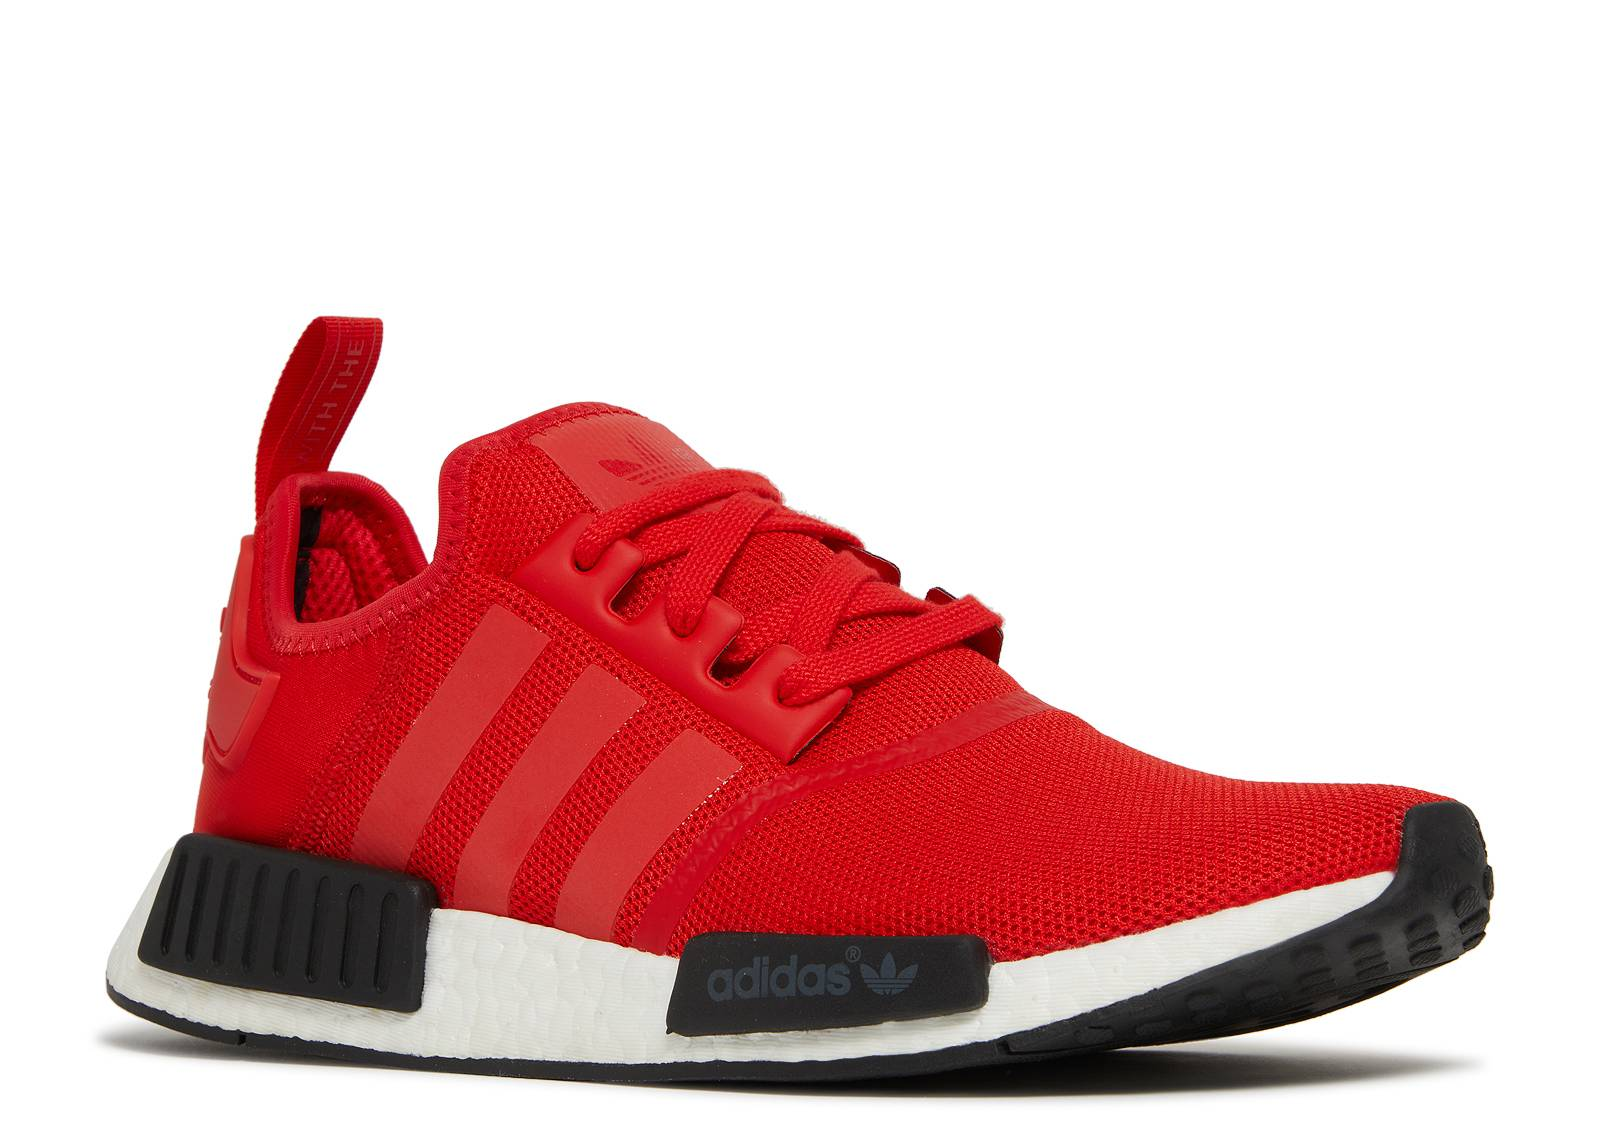 fd6d2c336 Nmd R1 - Adidas - bb1970 - red black